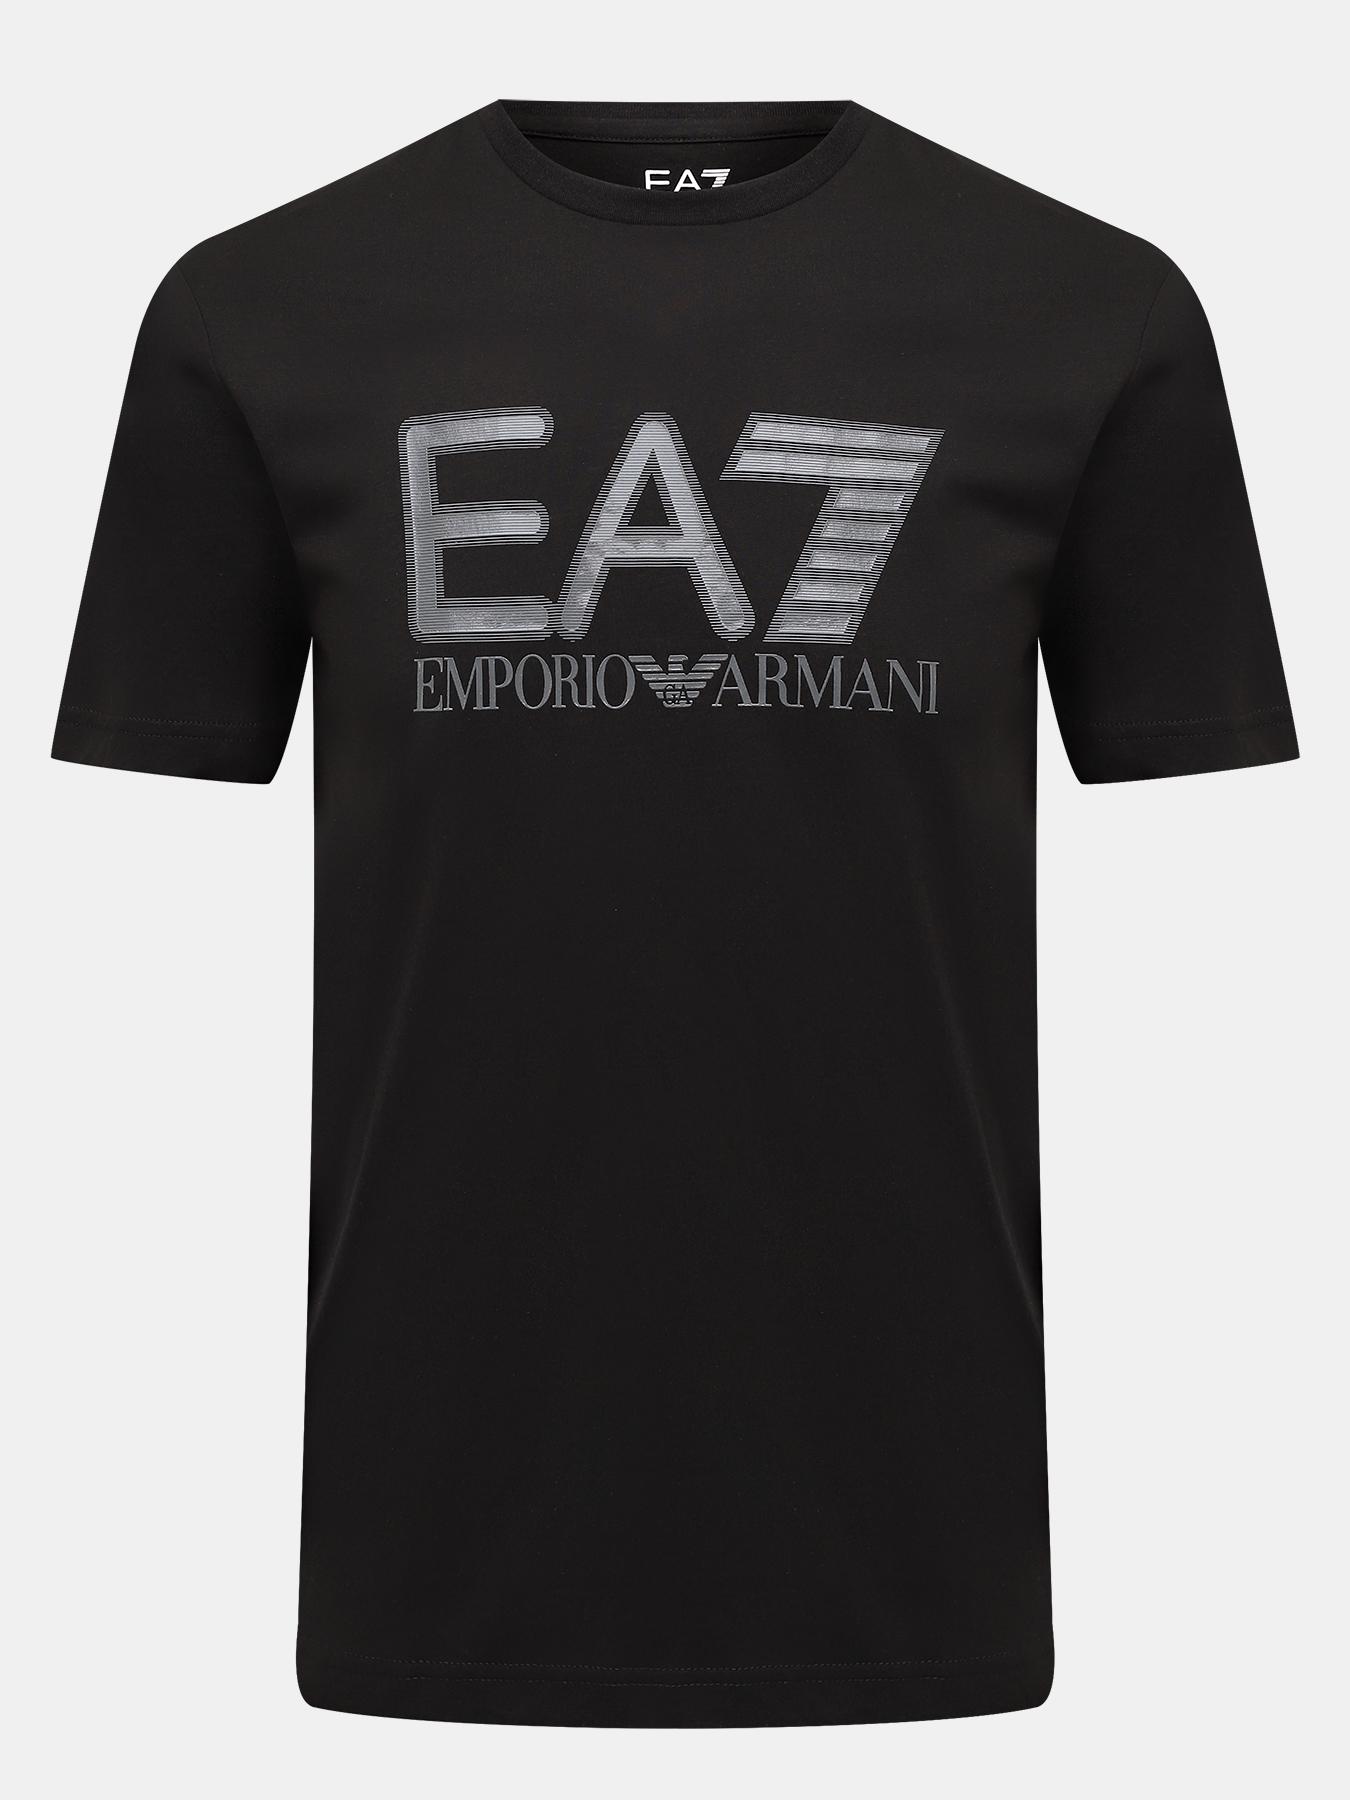 Футболки EA7 Emporio Armani Футболка ea7 шарф